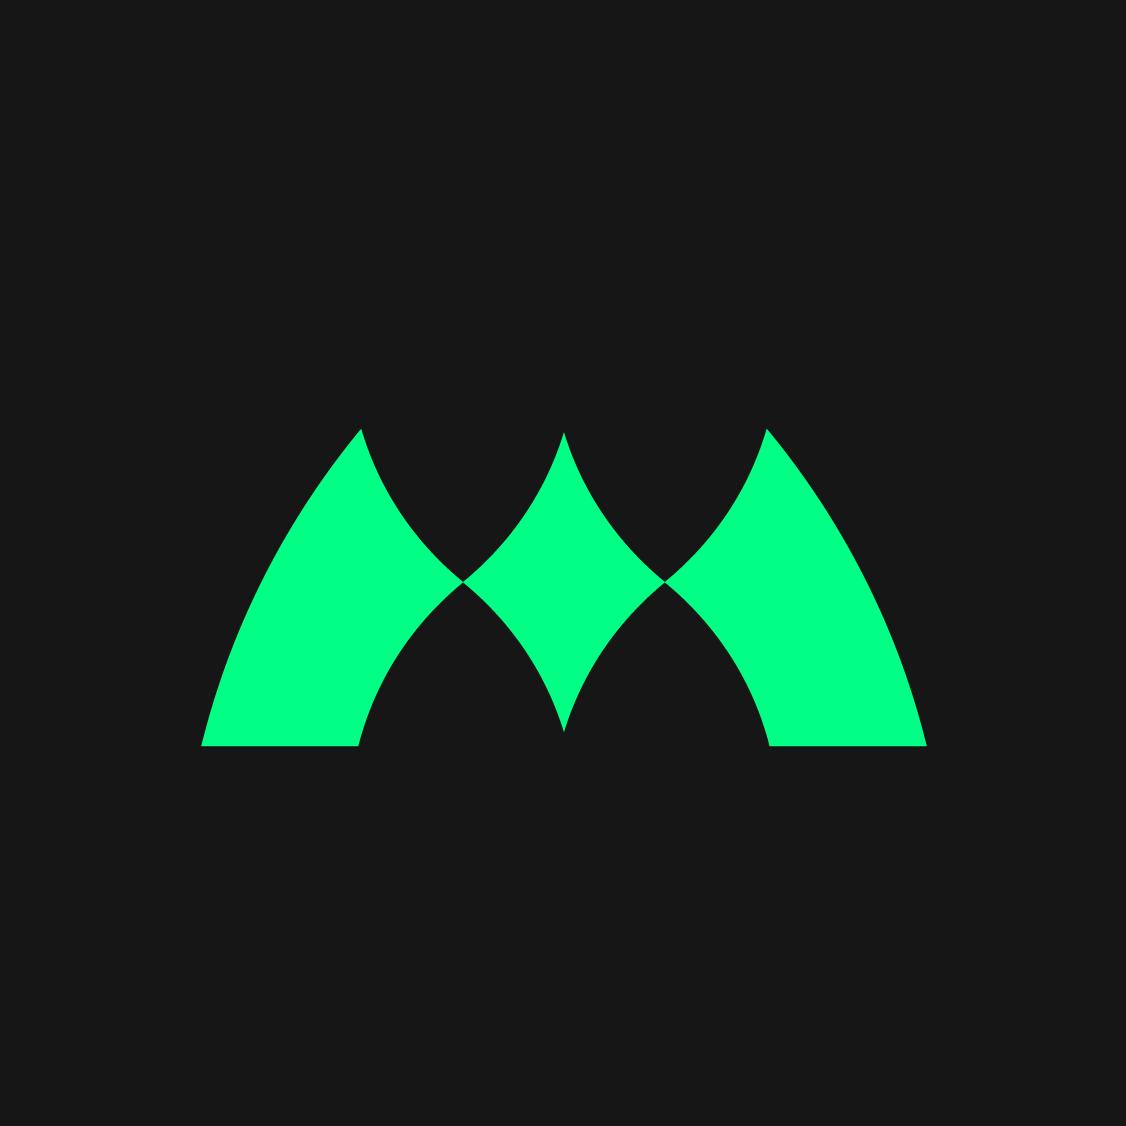 all-logos-2020-52